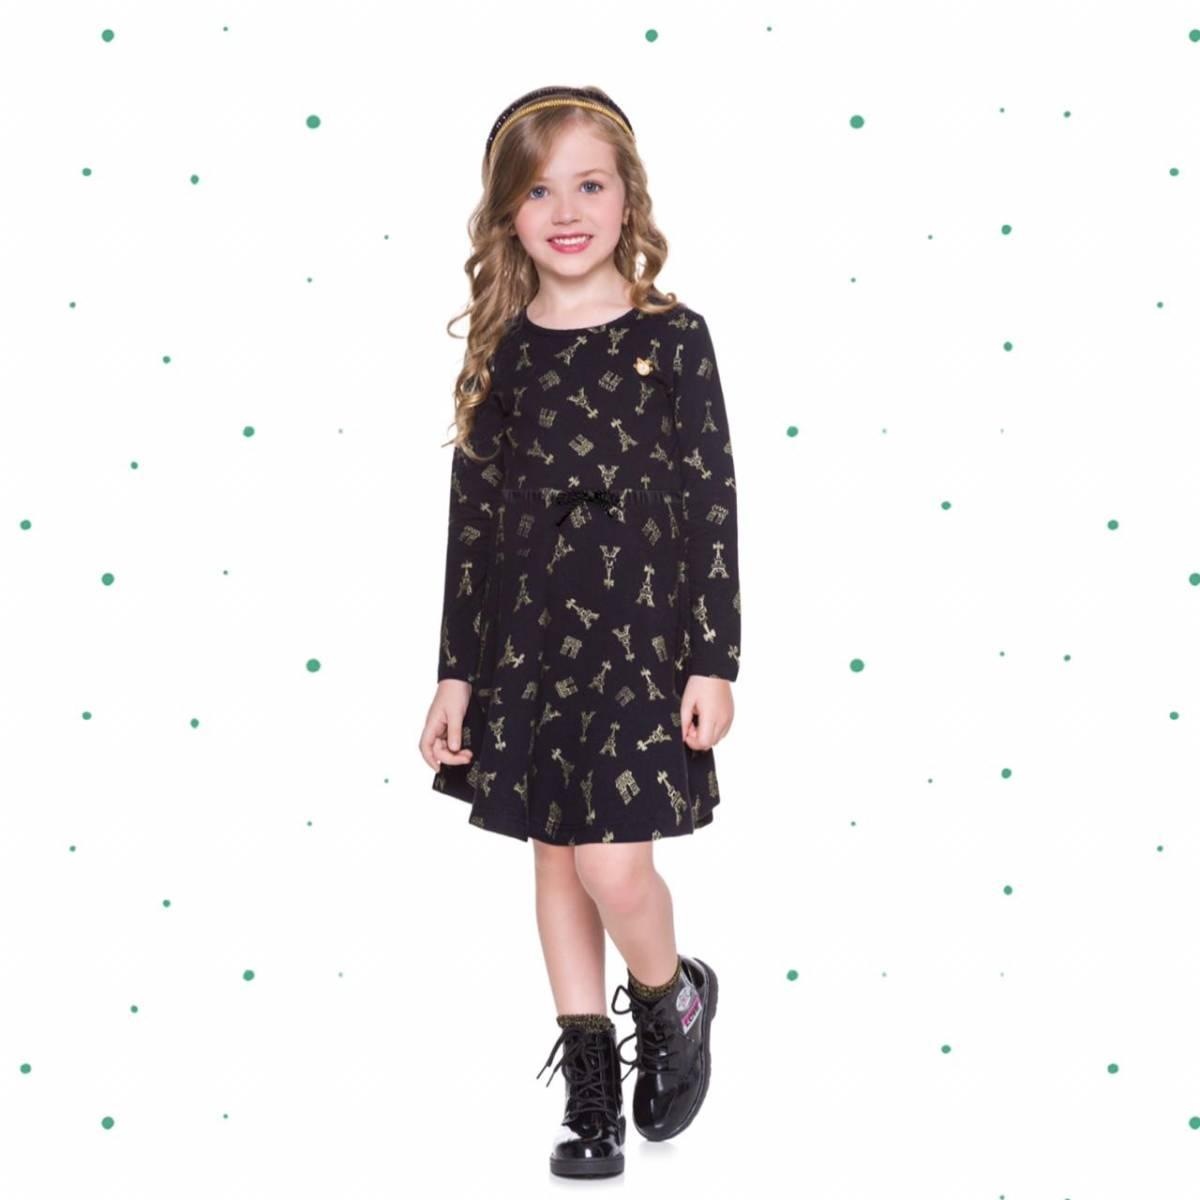 Vestido Infantil Milon em Molicotton Estampado